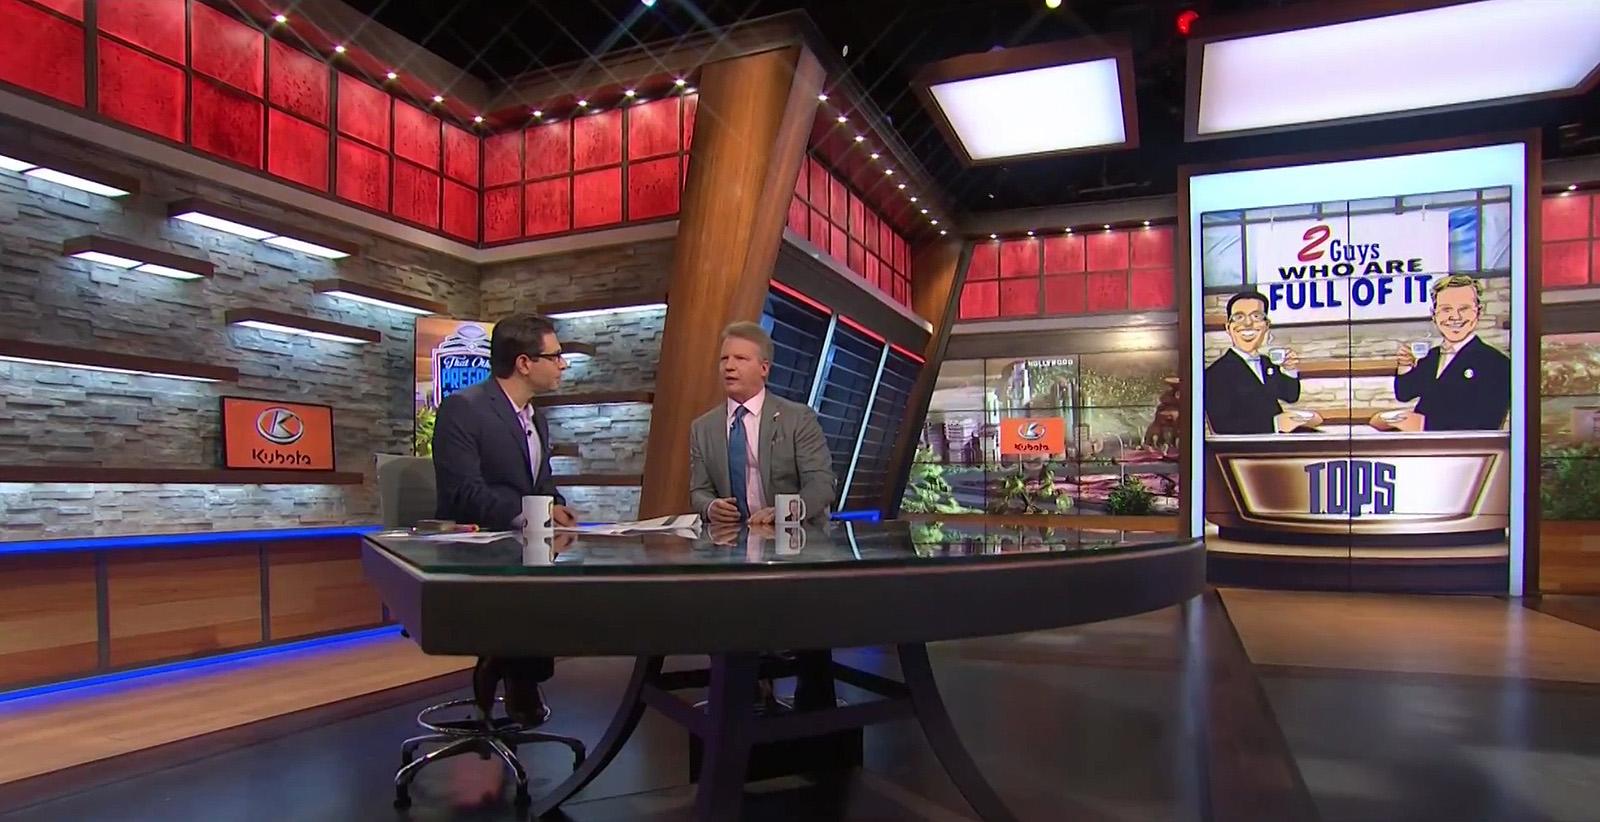 NCS_CBS-Sports-Network-Studio-2018_0013